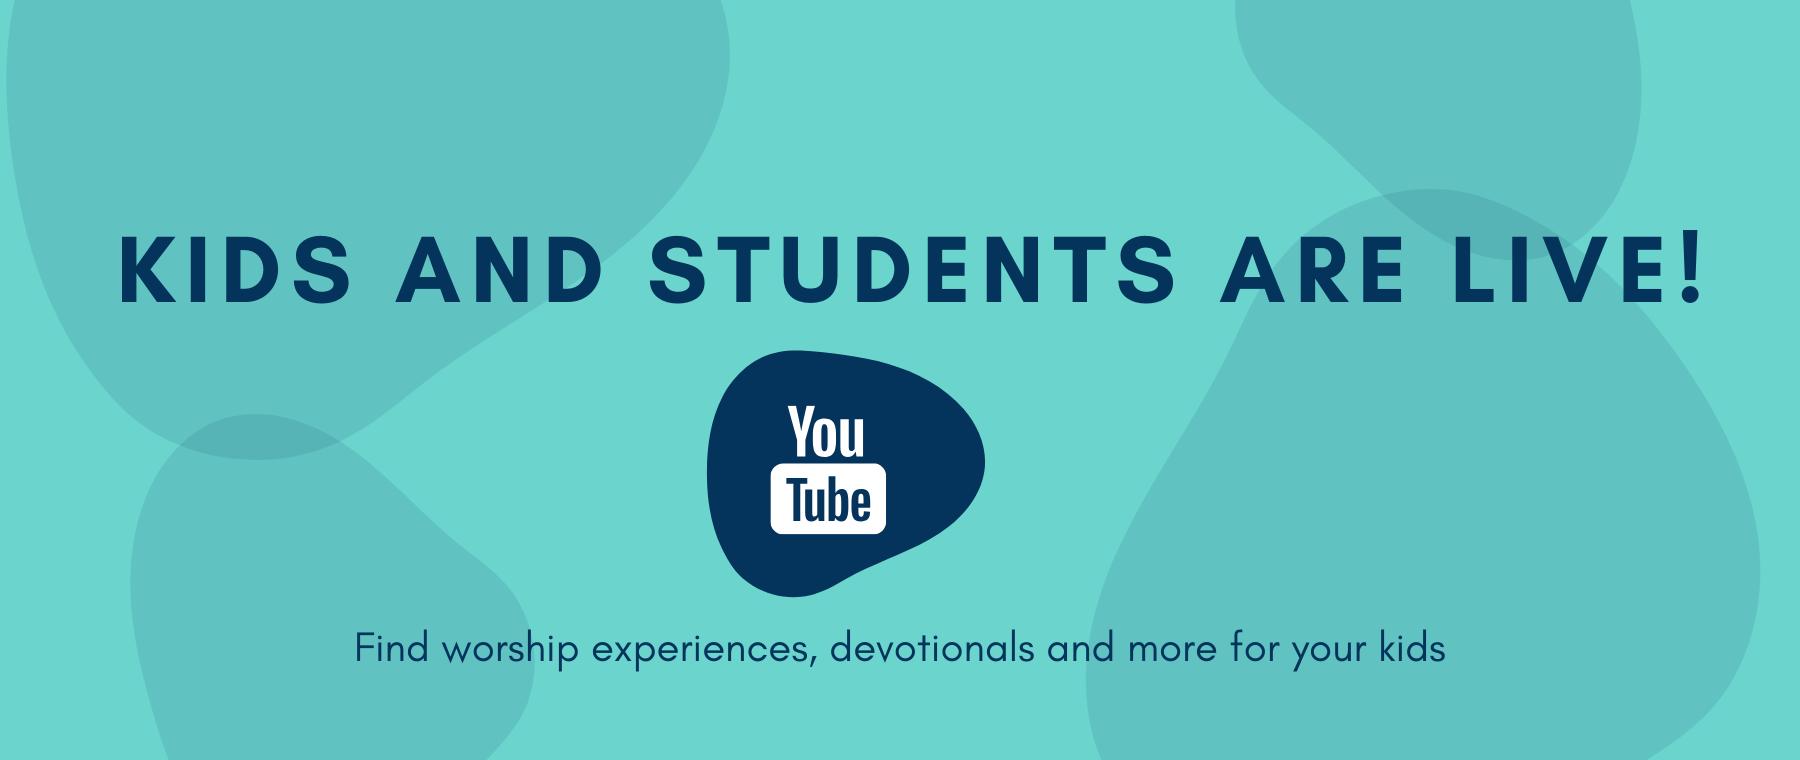 STudents Youtube